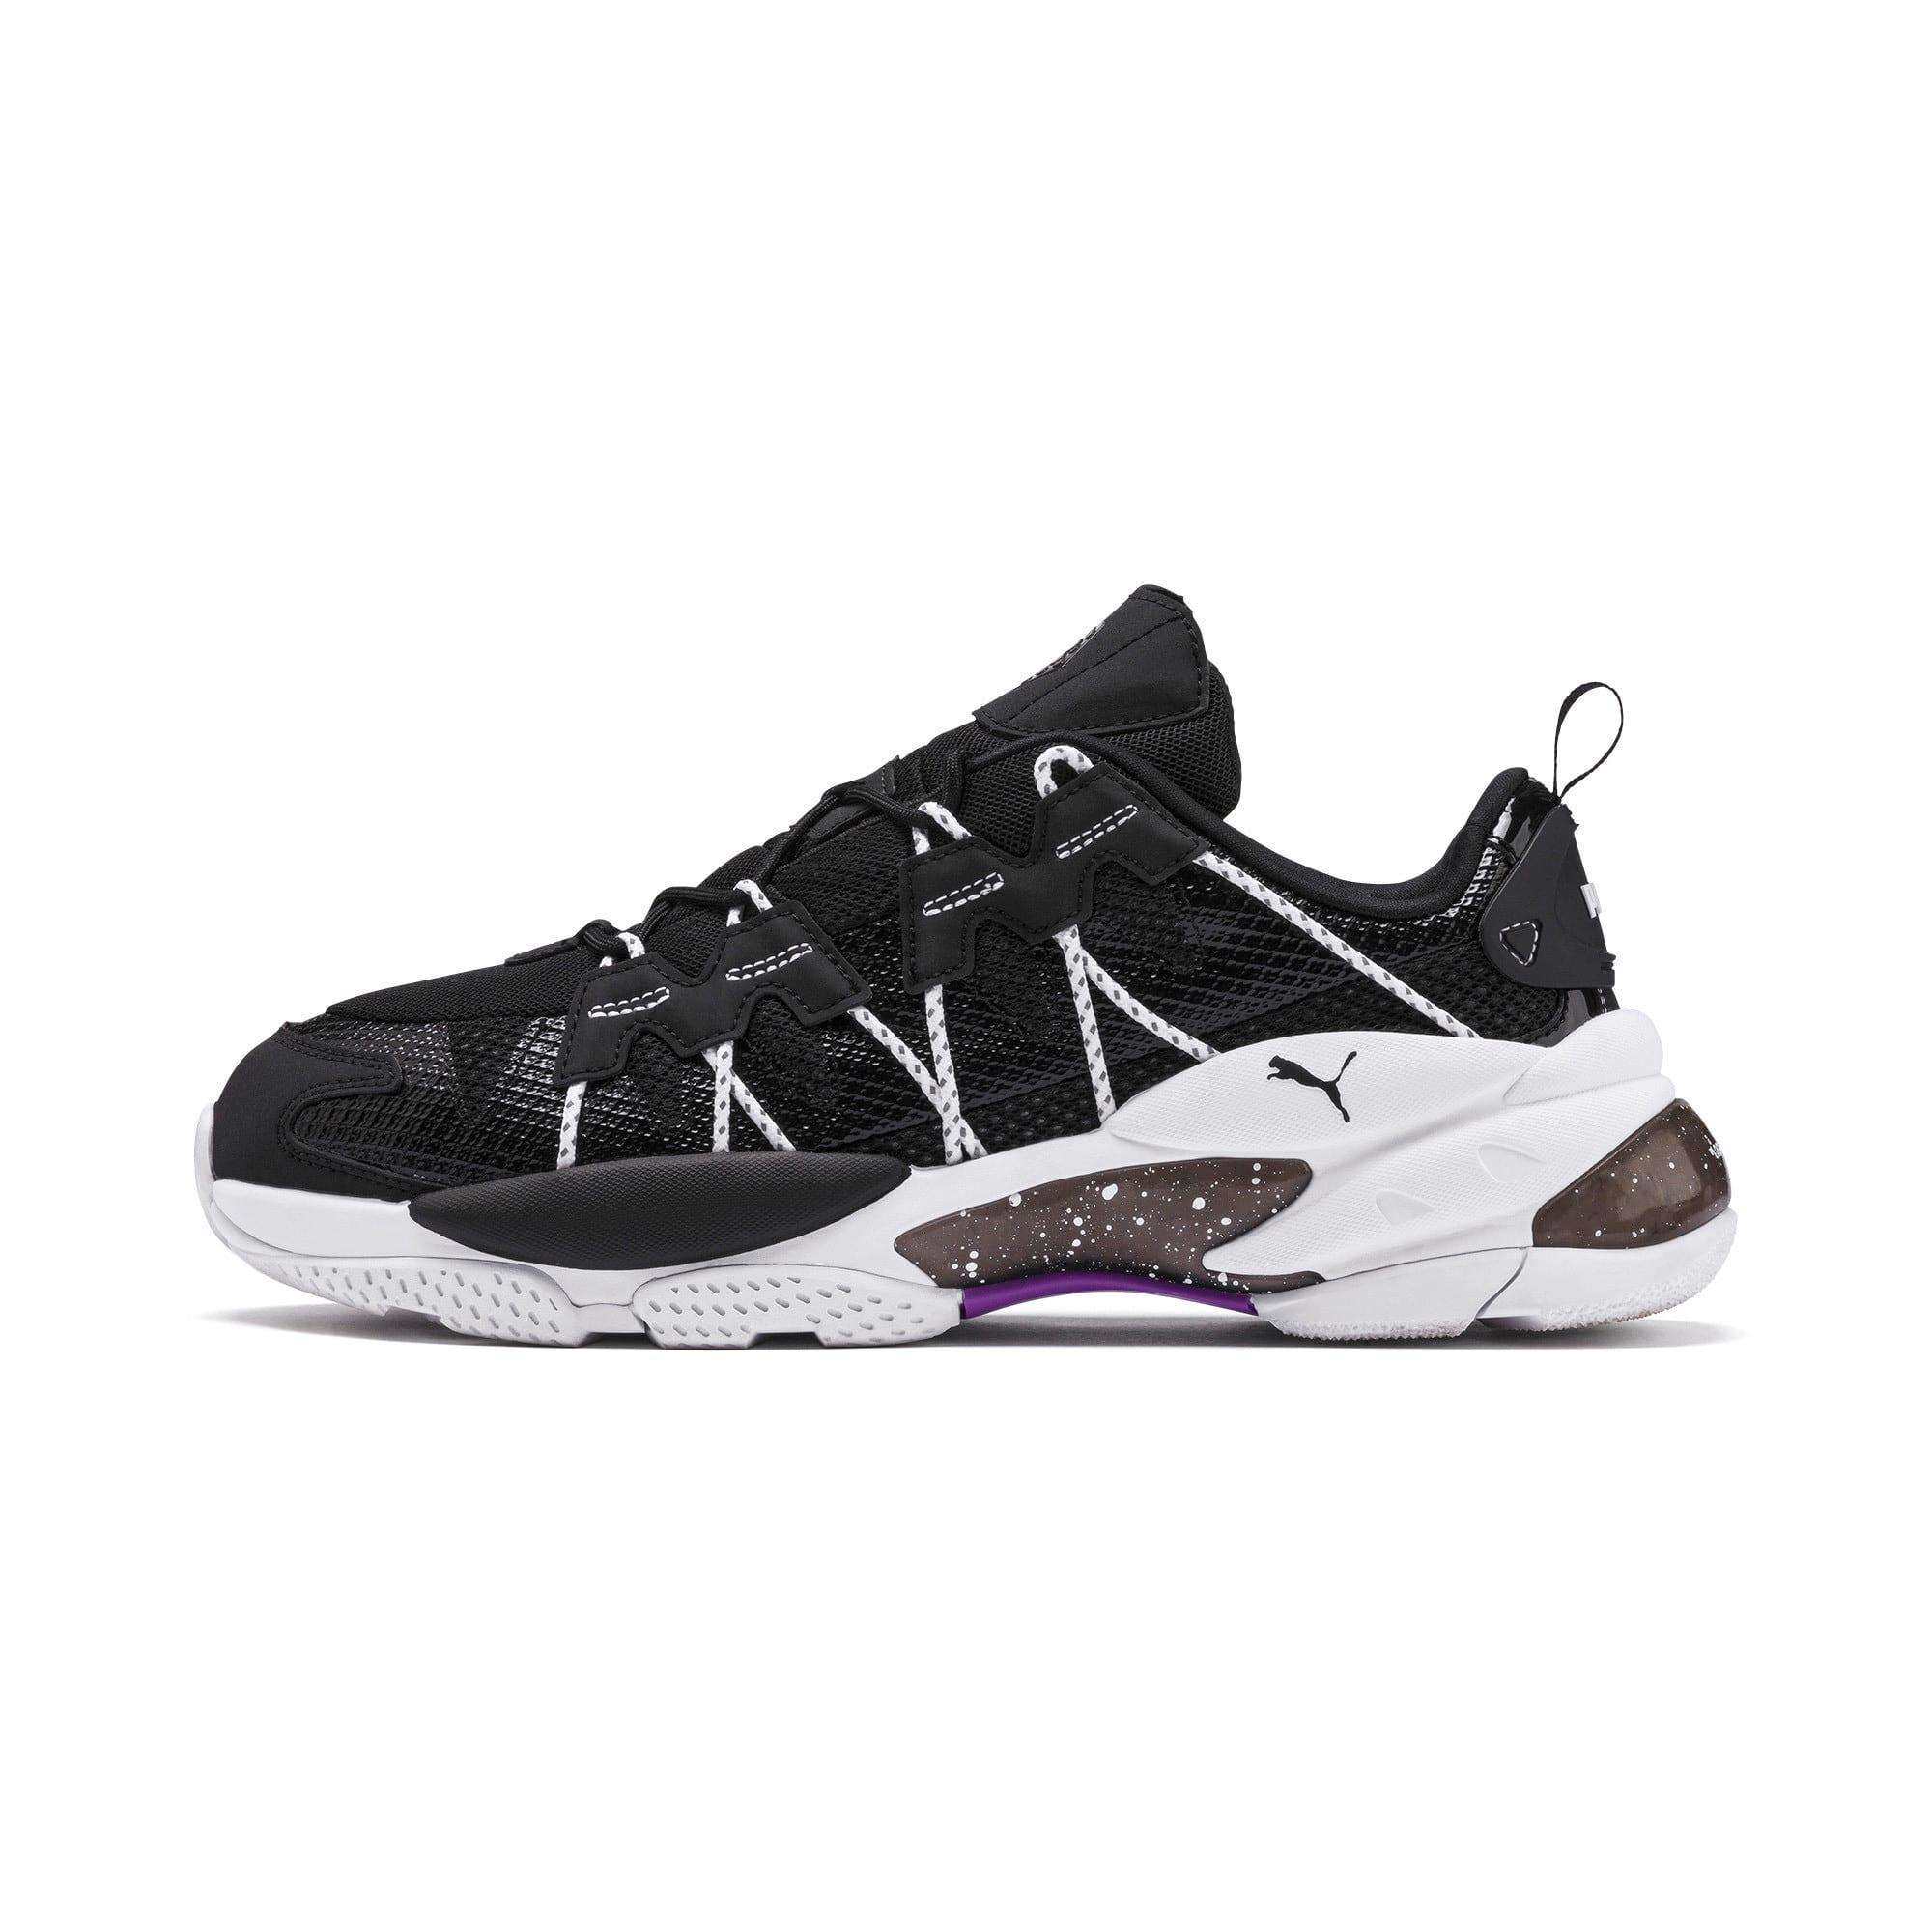 Thumbnail 1 of LQDCELL Omega Density Sneaker, Puma Black, medium